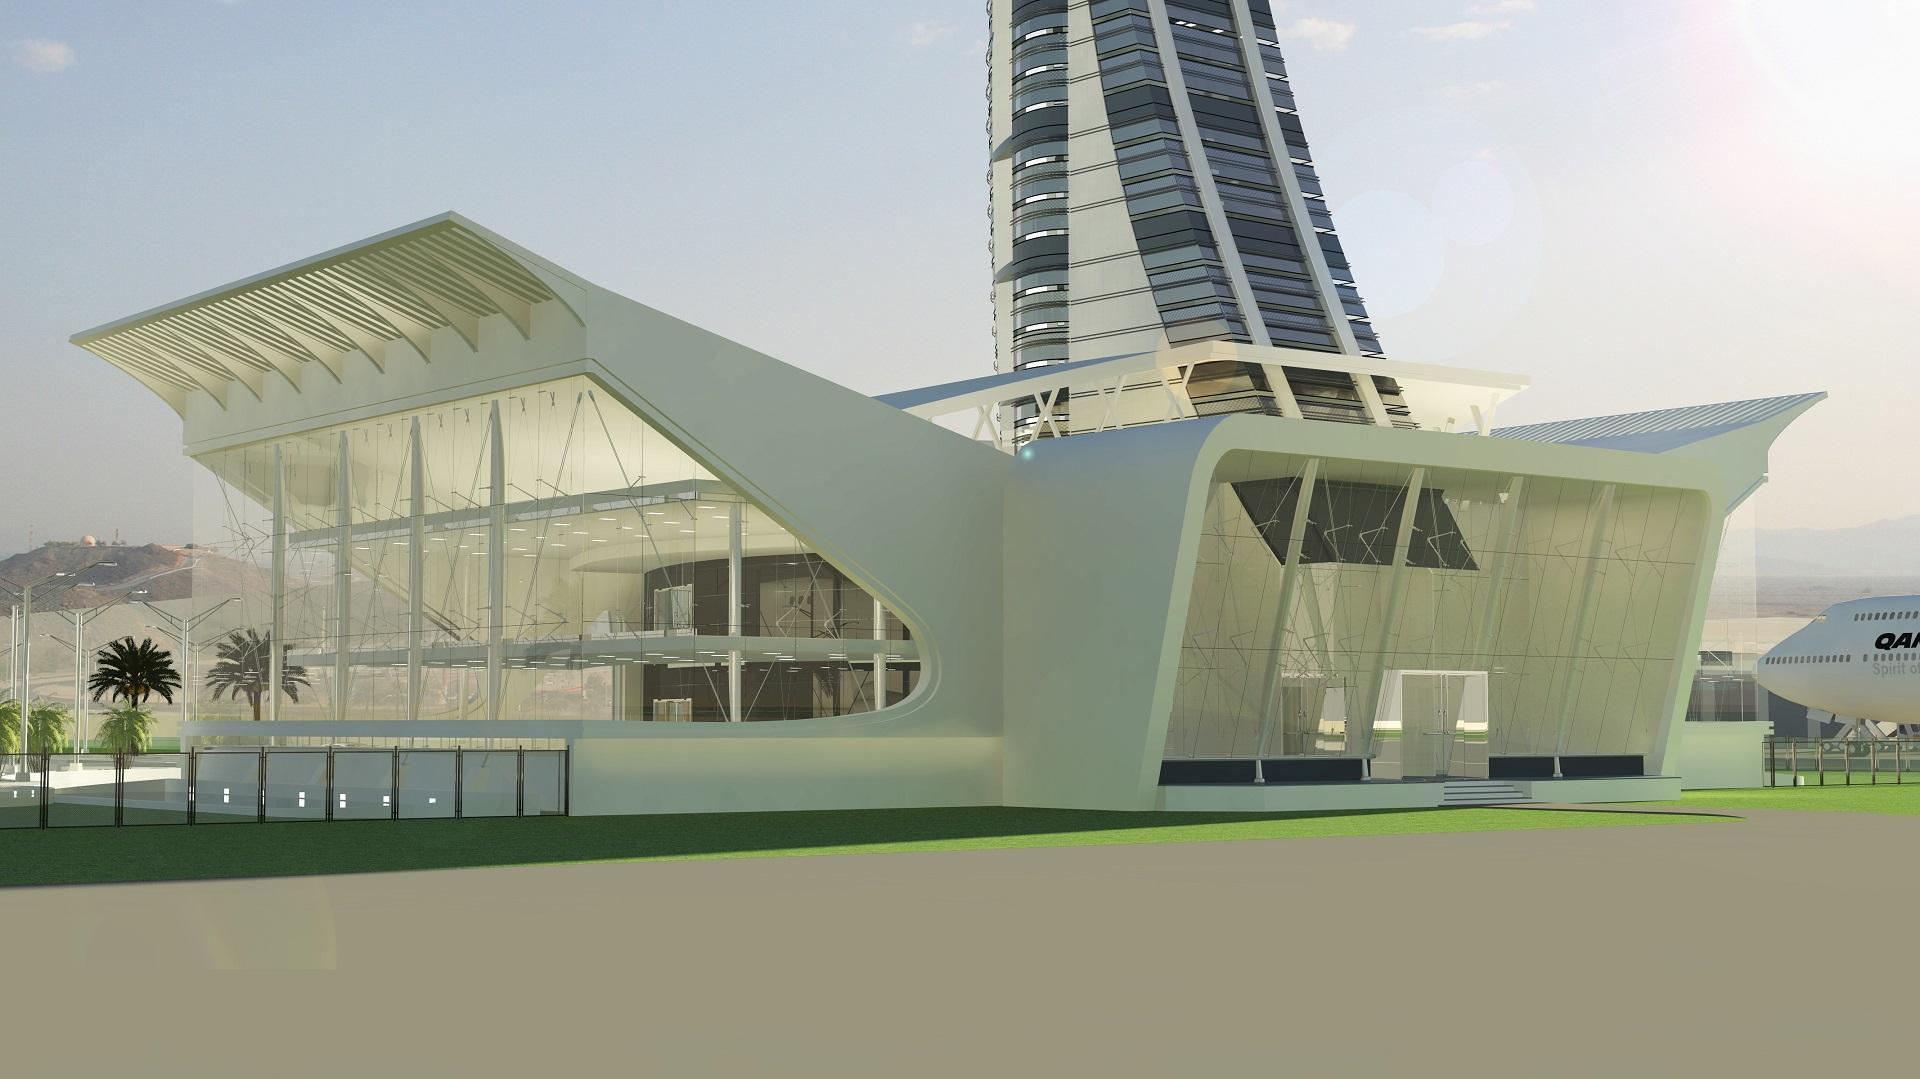 FIA Control Office Block AirSide